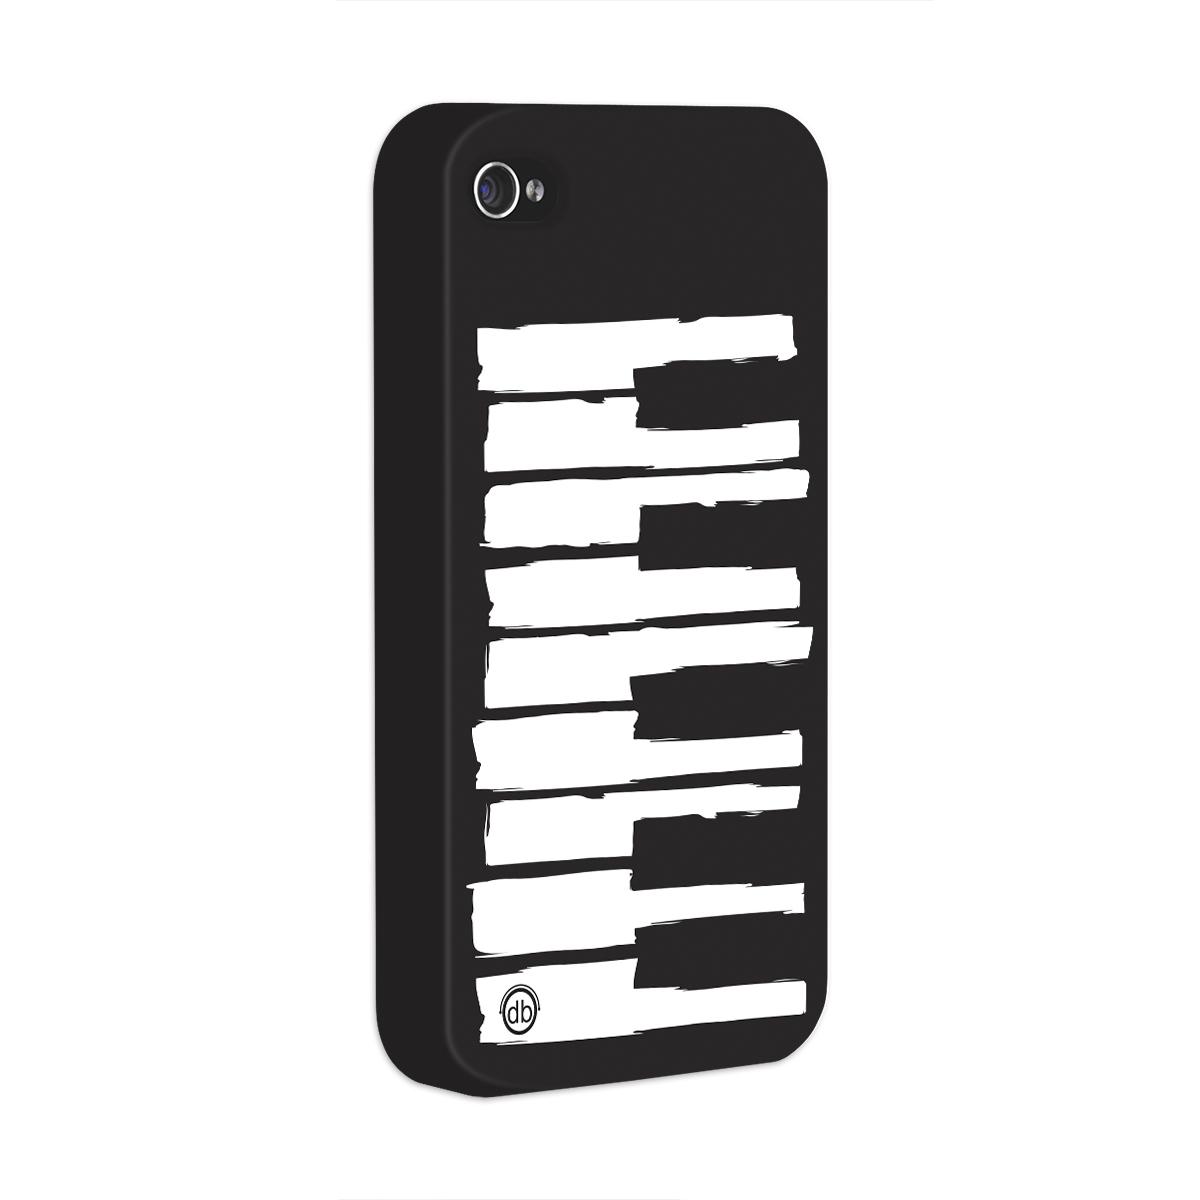 Capa para iPhone 4/4S Dudu Borges Musical Keyboard  - bandUP Store Marketplace